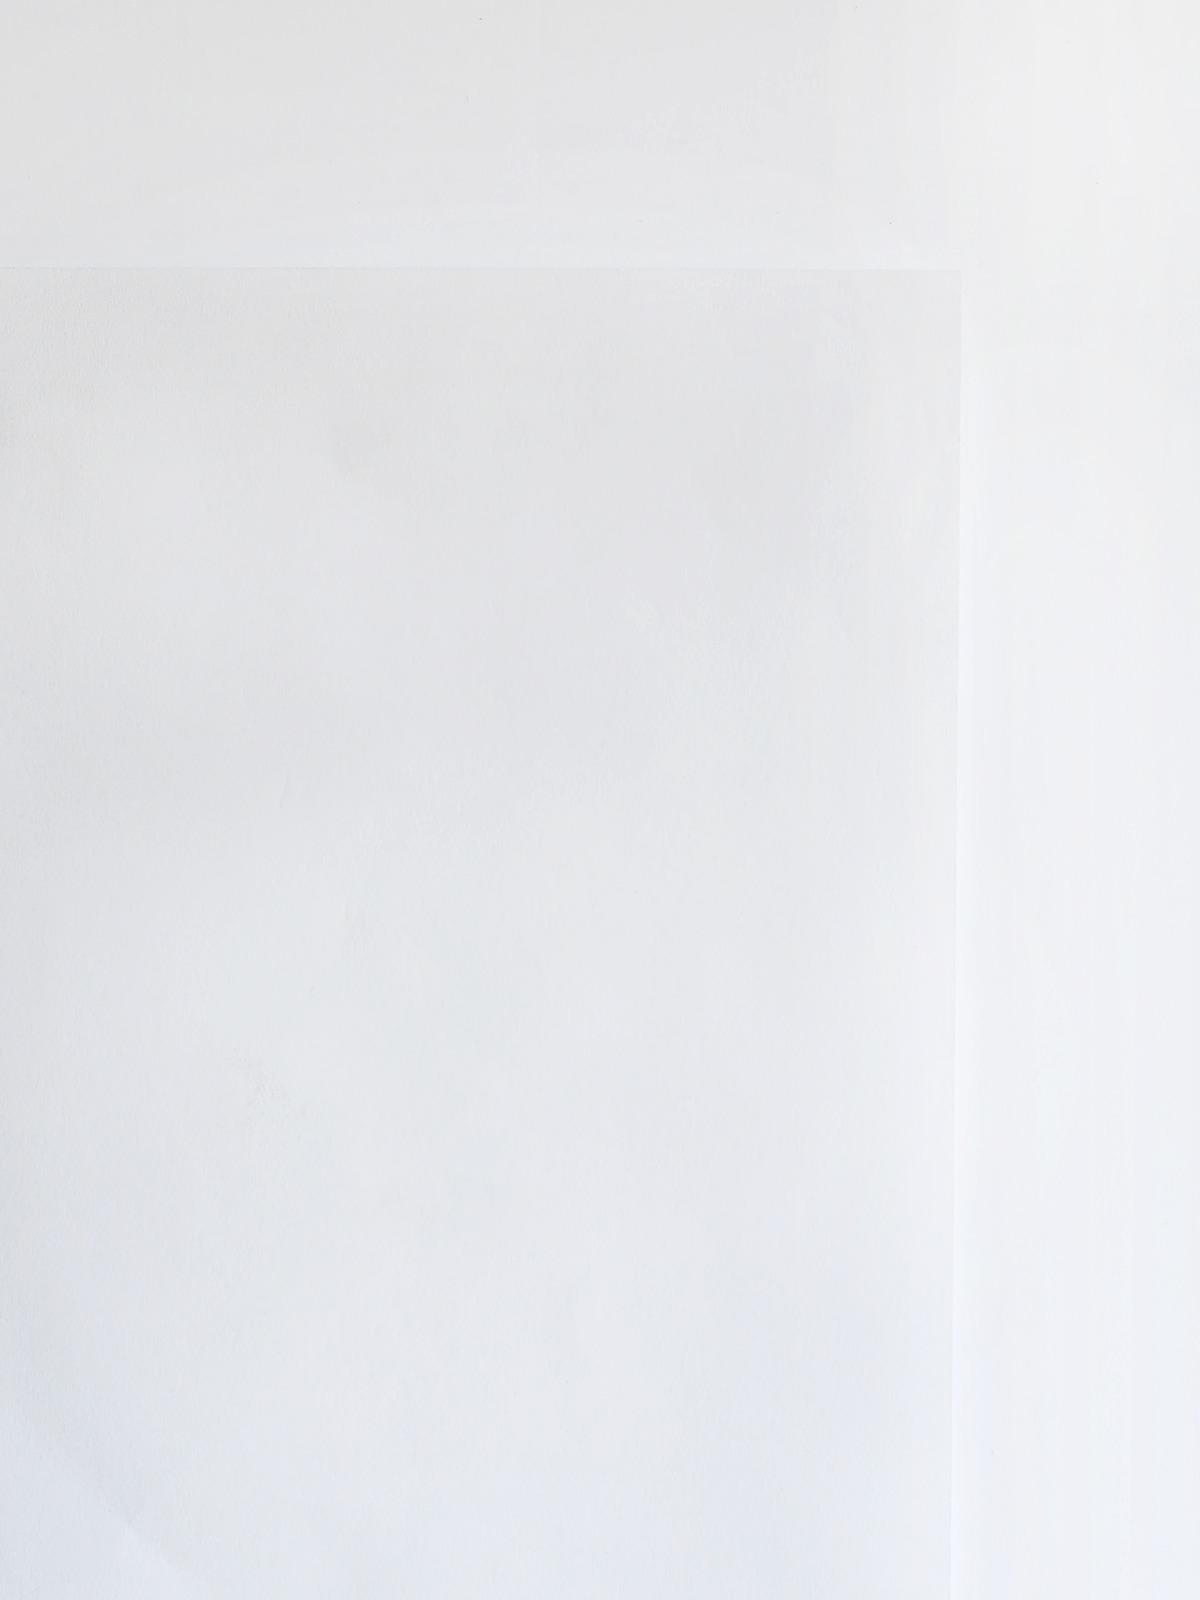 Interleaving Paper Sheets